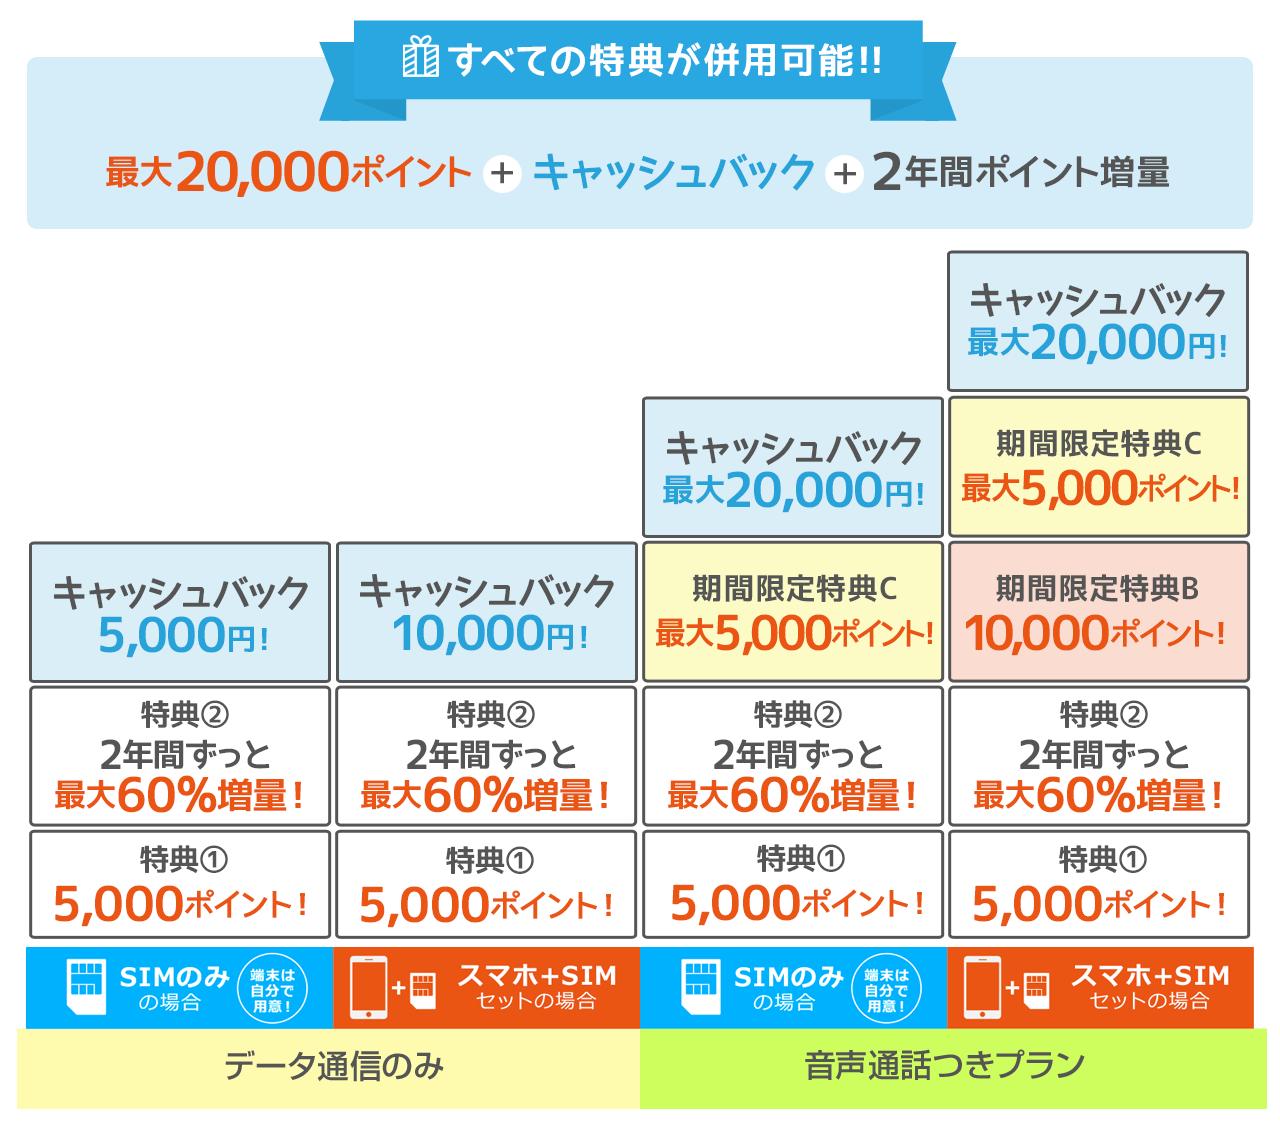 biglobe_graph_01_c_0801